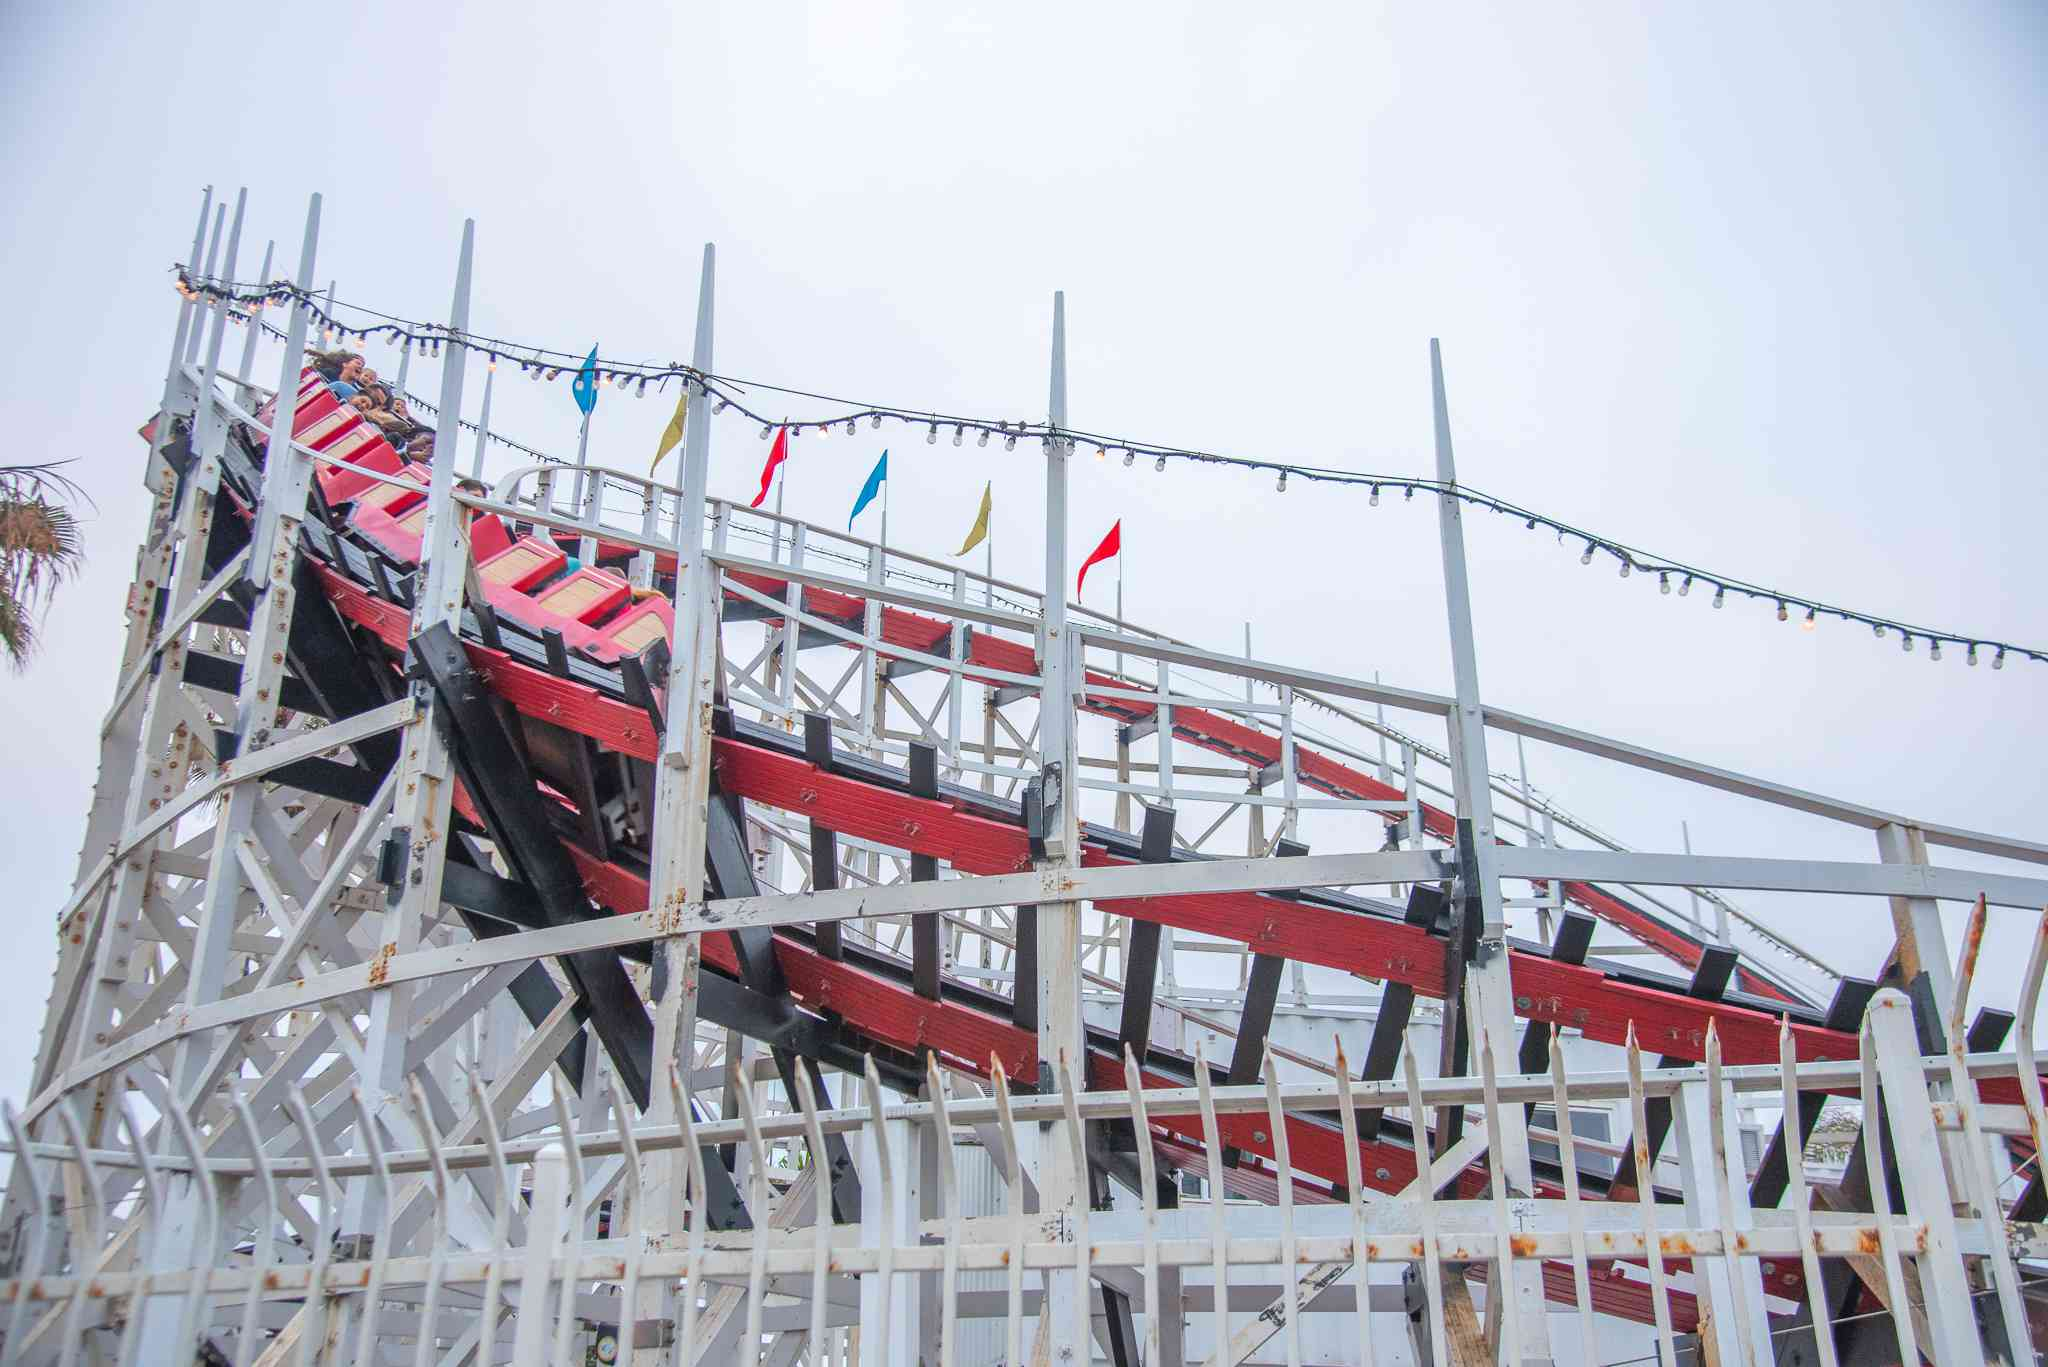 Roller Coaster at Belmont Park in San Diego, CA